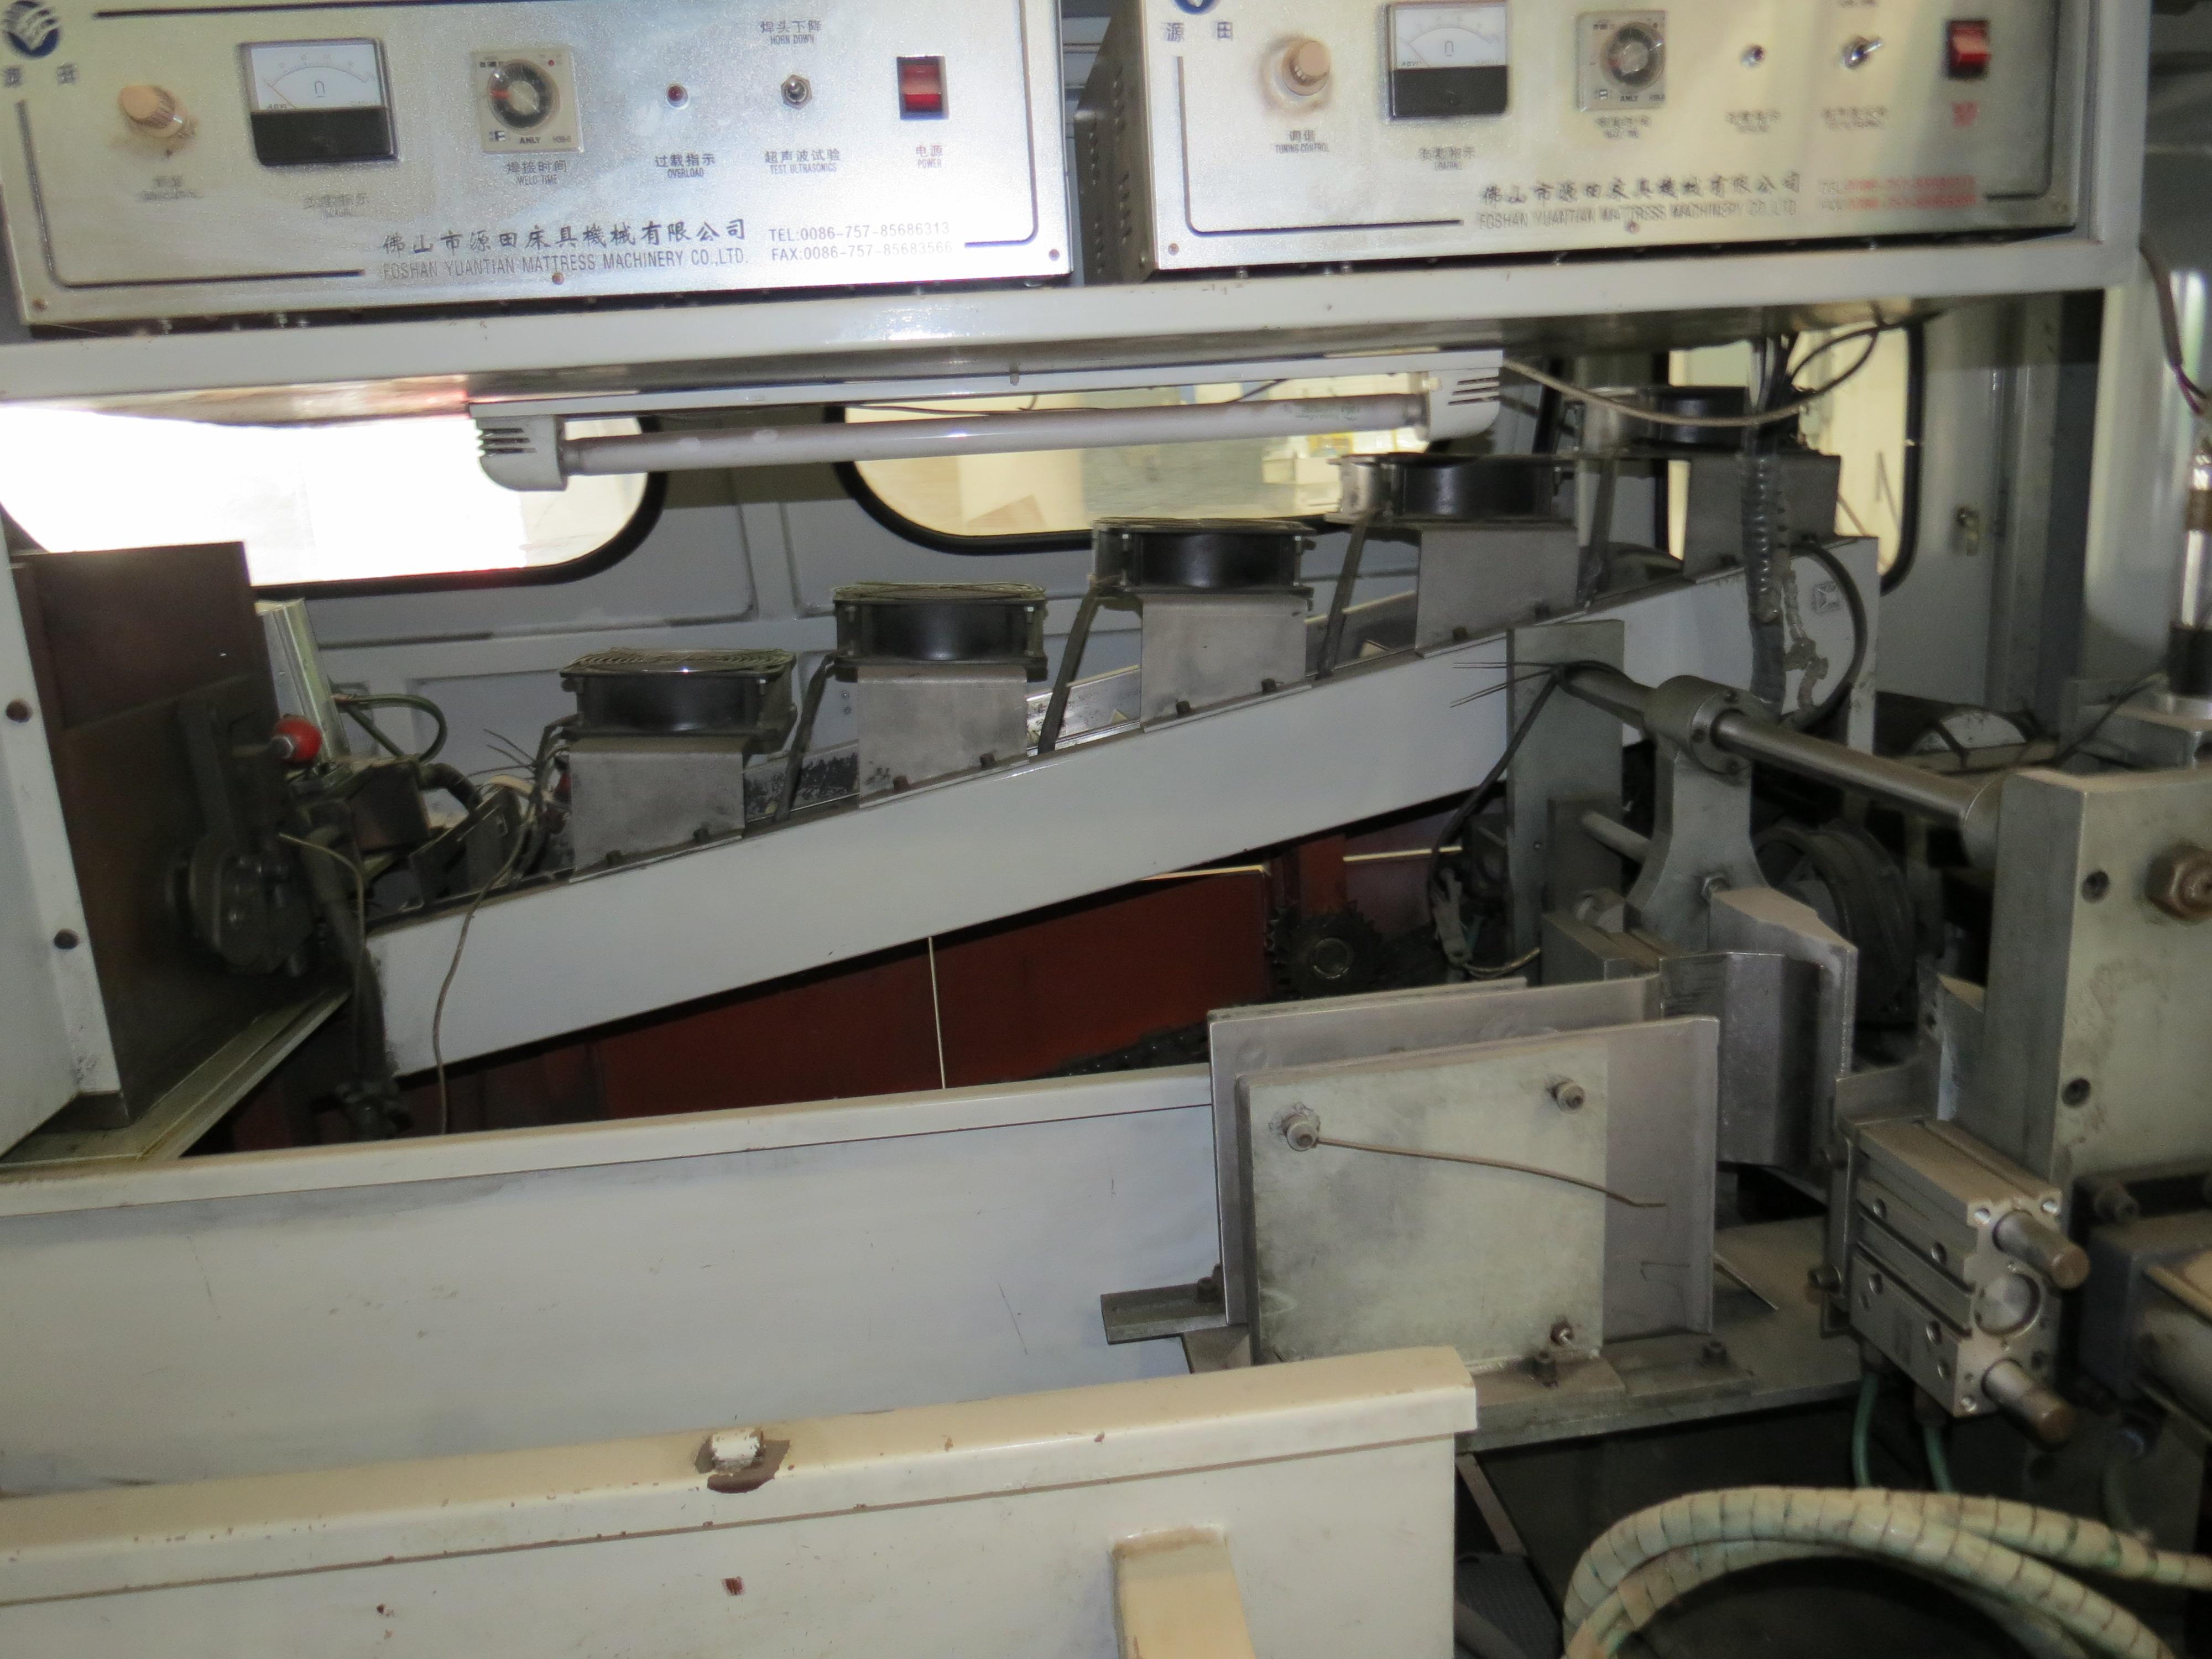 Foshan Yuatian Mattress Machine DZ-6AAutomatic Pocket Spring Machine, 220V, SN:0905005022 - Image 4 of 5